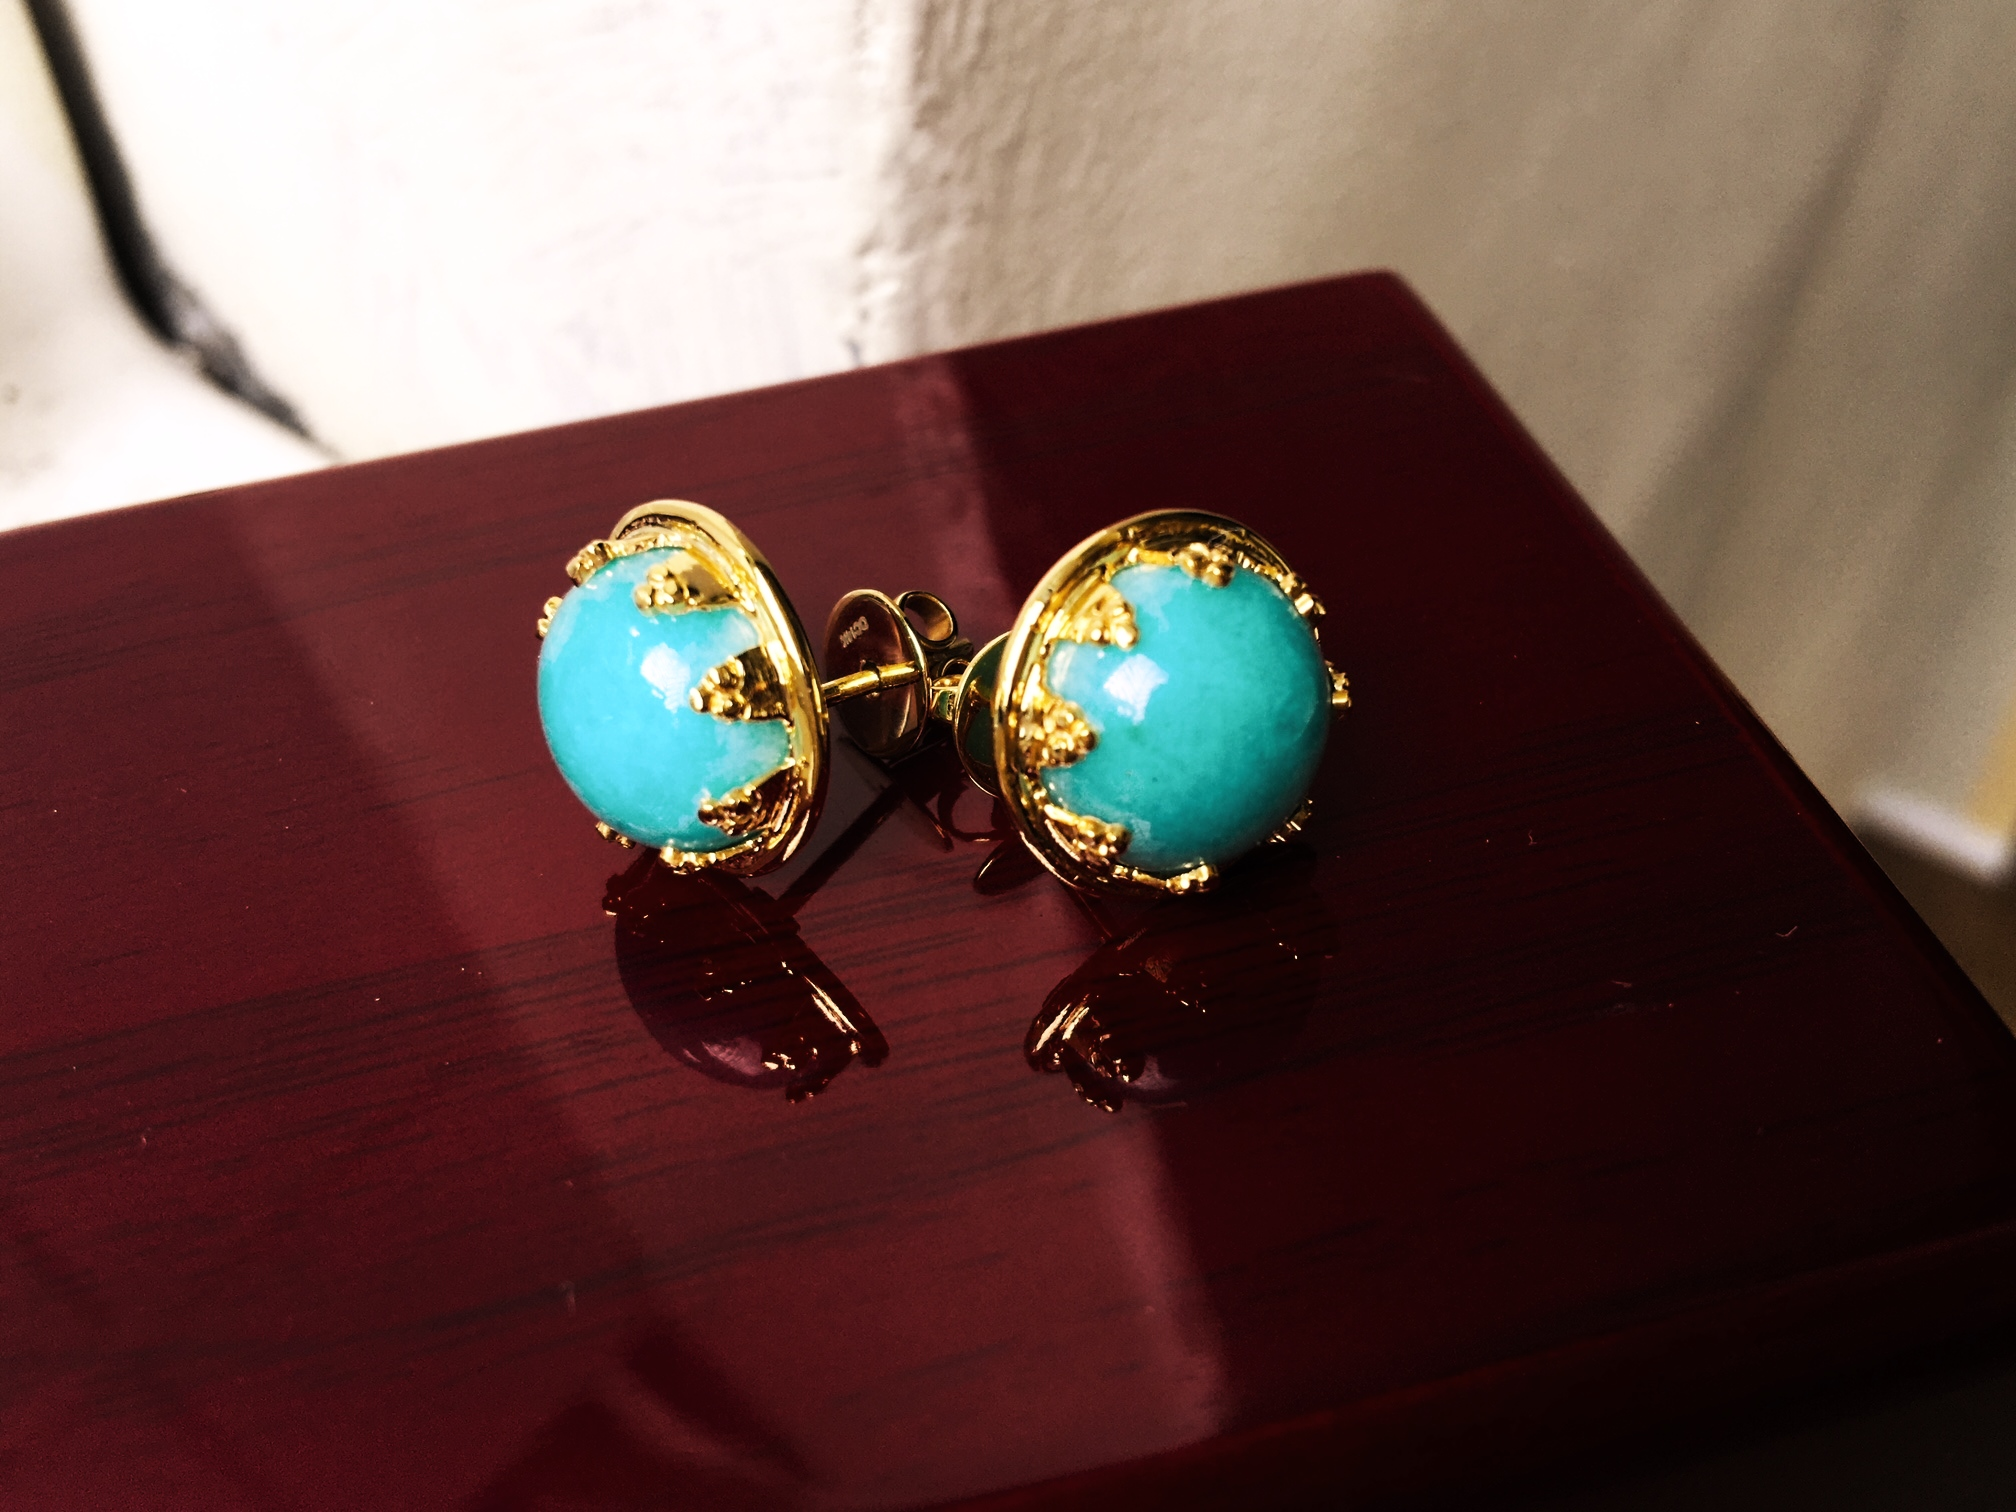 Yellowgold Torquise Stud Earrings